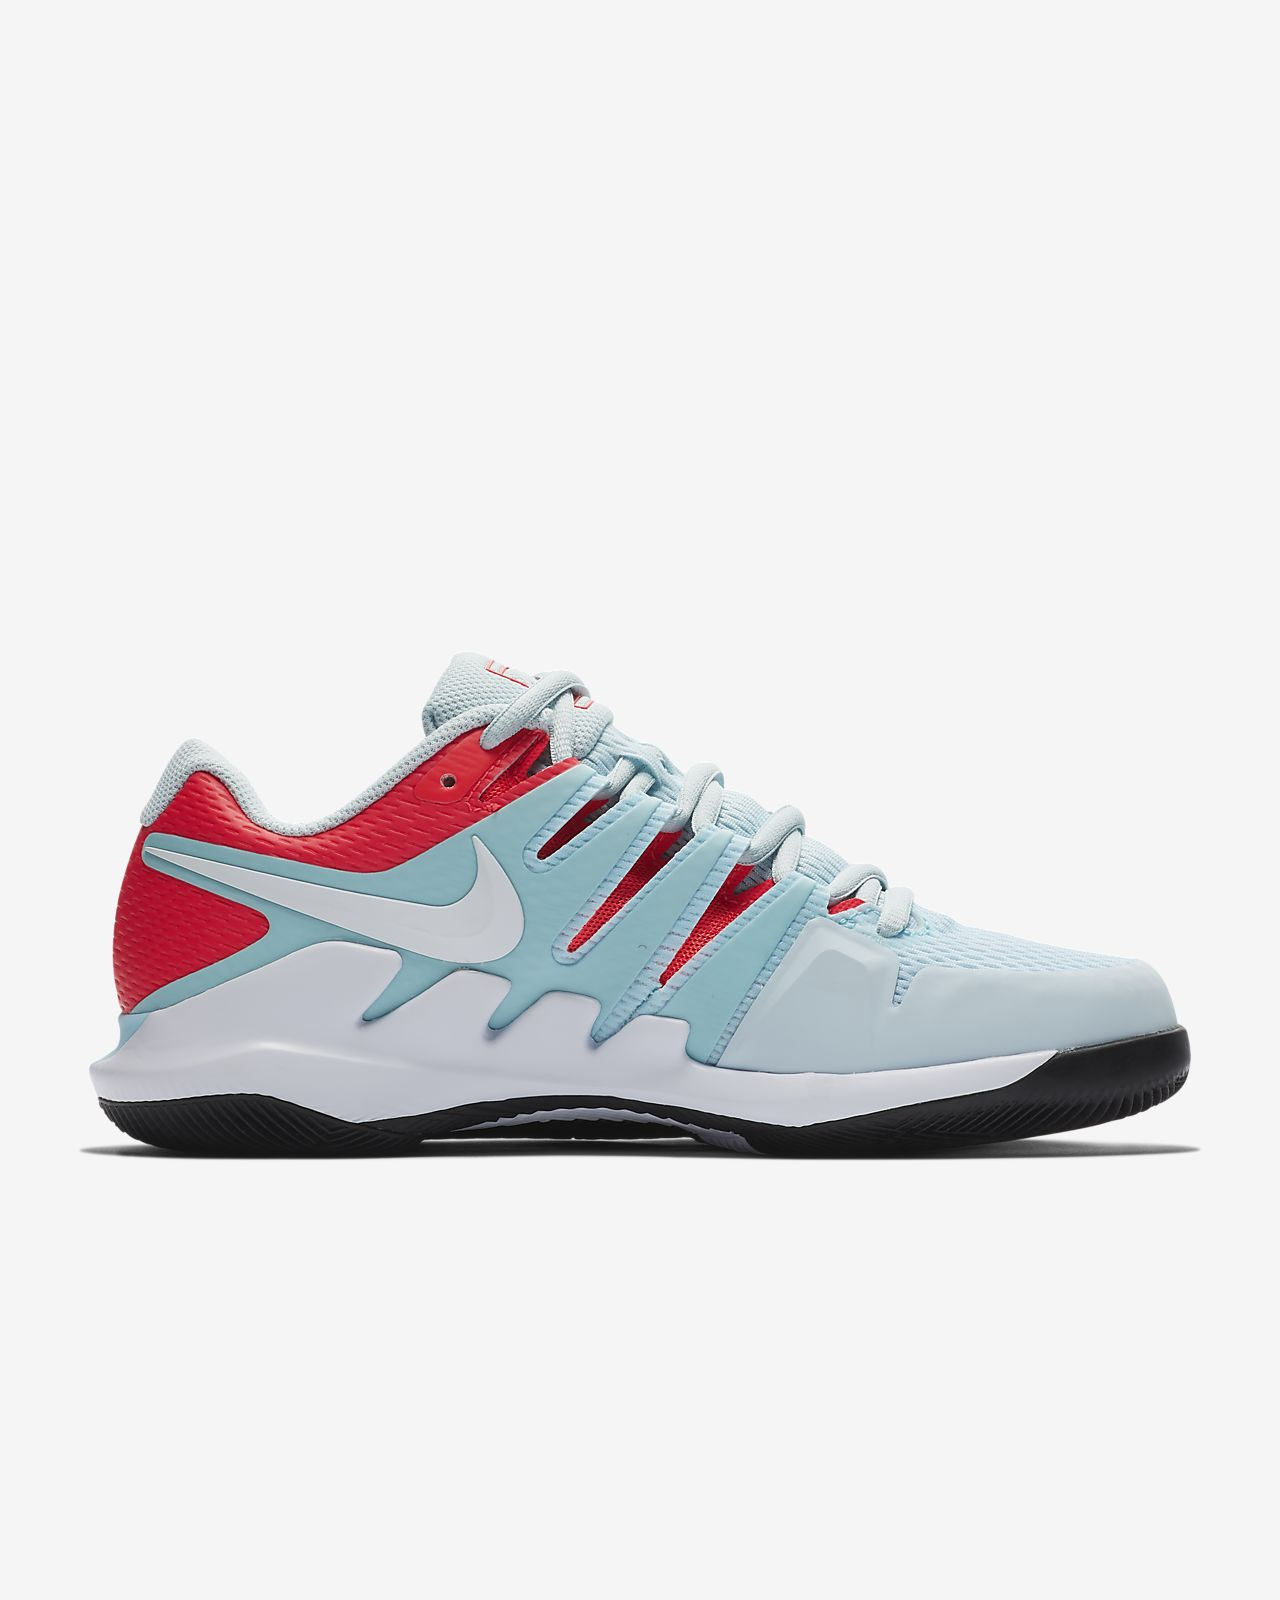 6c763c51b1 ... Calzado de tenis para cancha dura para mujer NikeCourt Air Zoom Vapor X